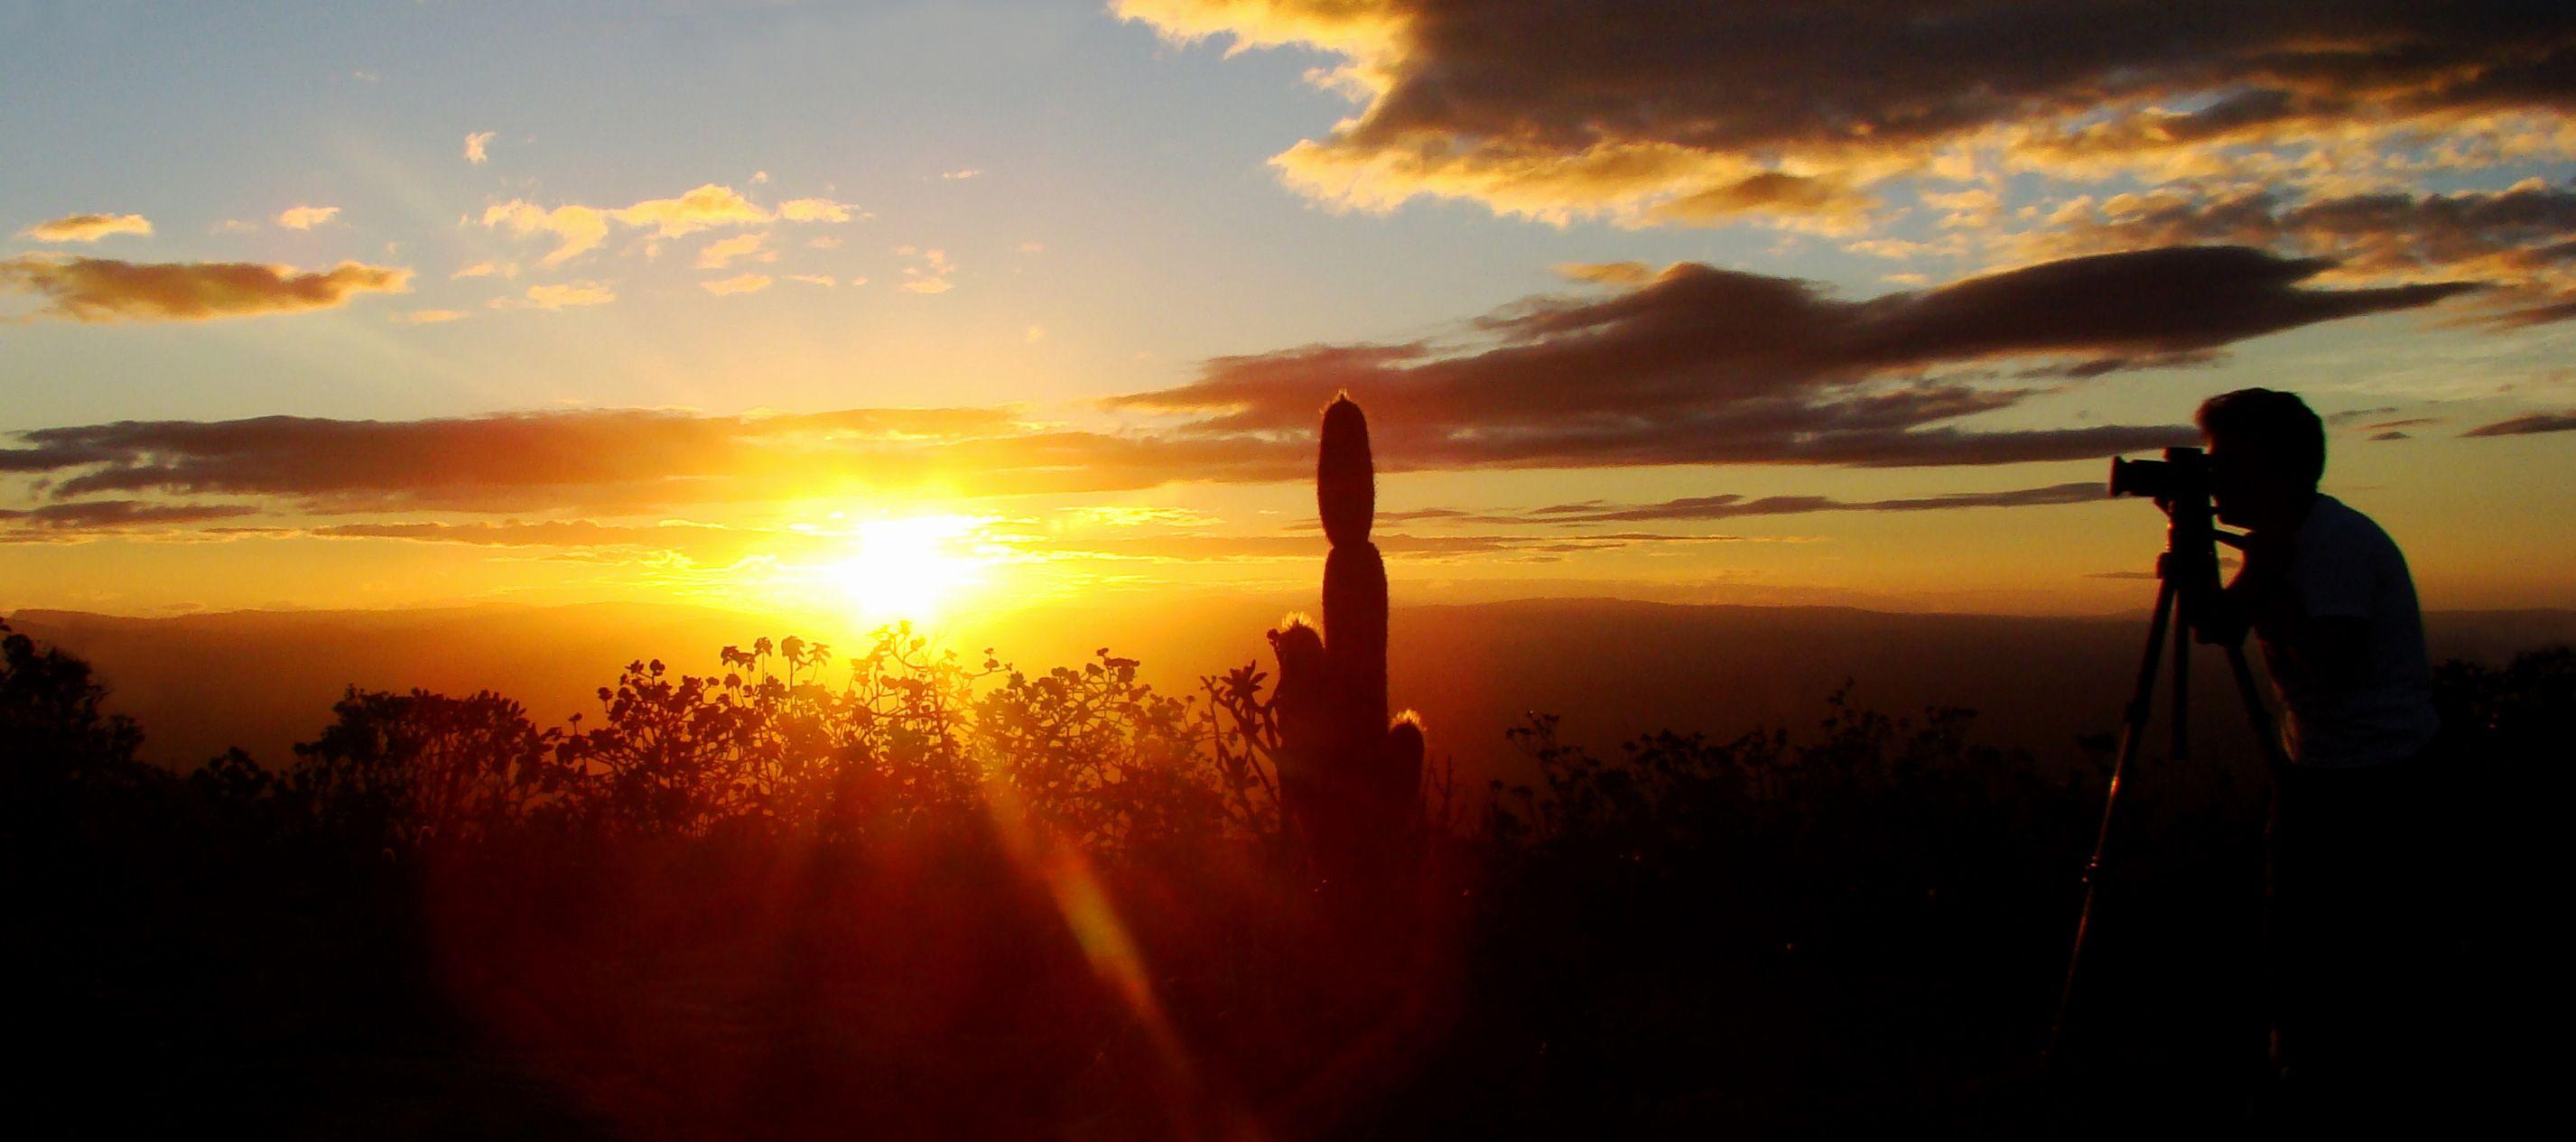 Por do Sol na Chapada Diamantina - Bahia (Por Soraya)